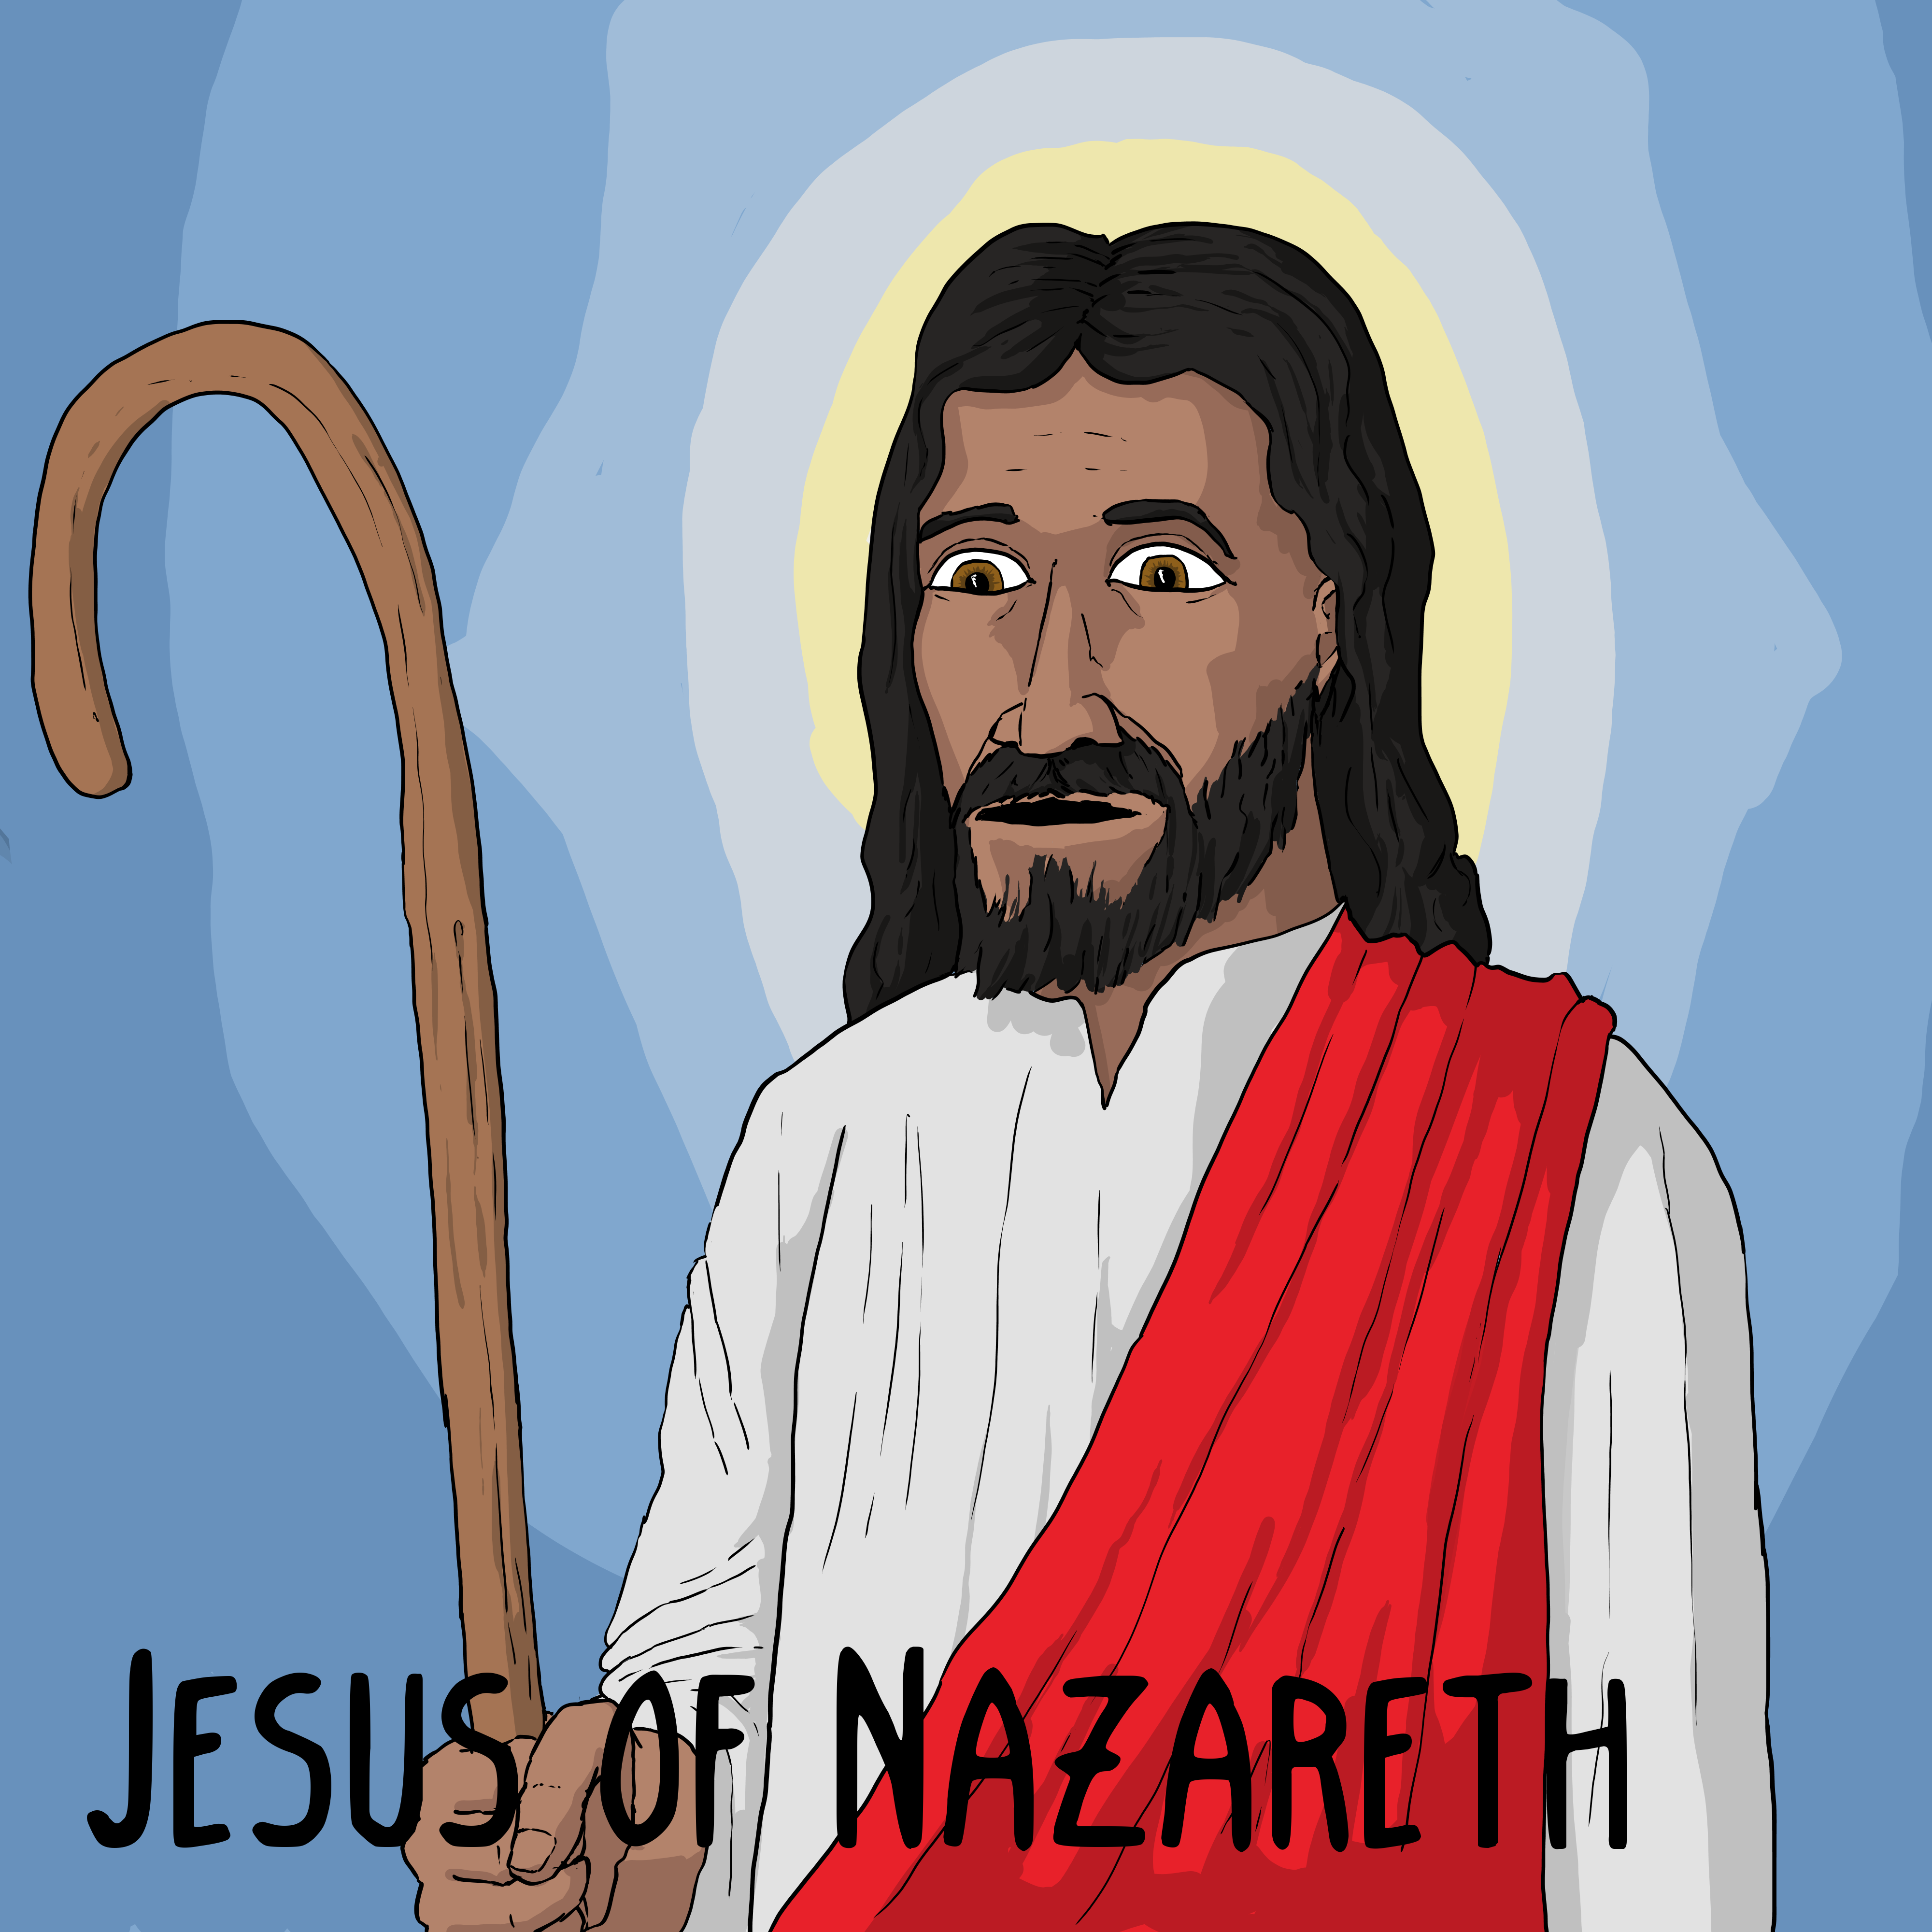 Jesus by Corey Mohler